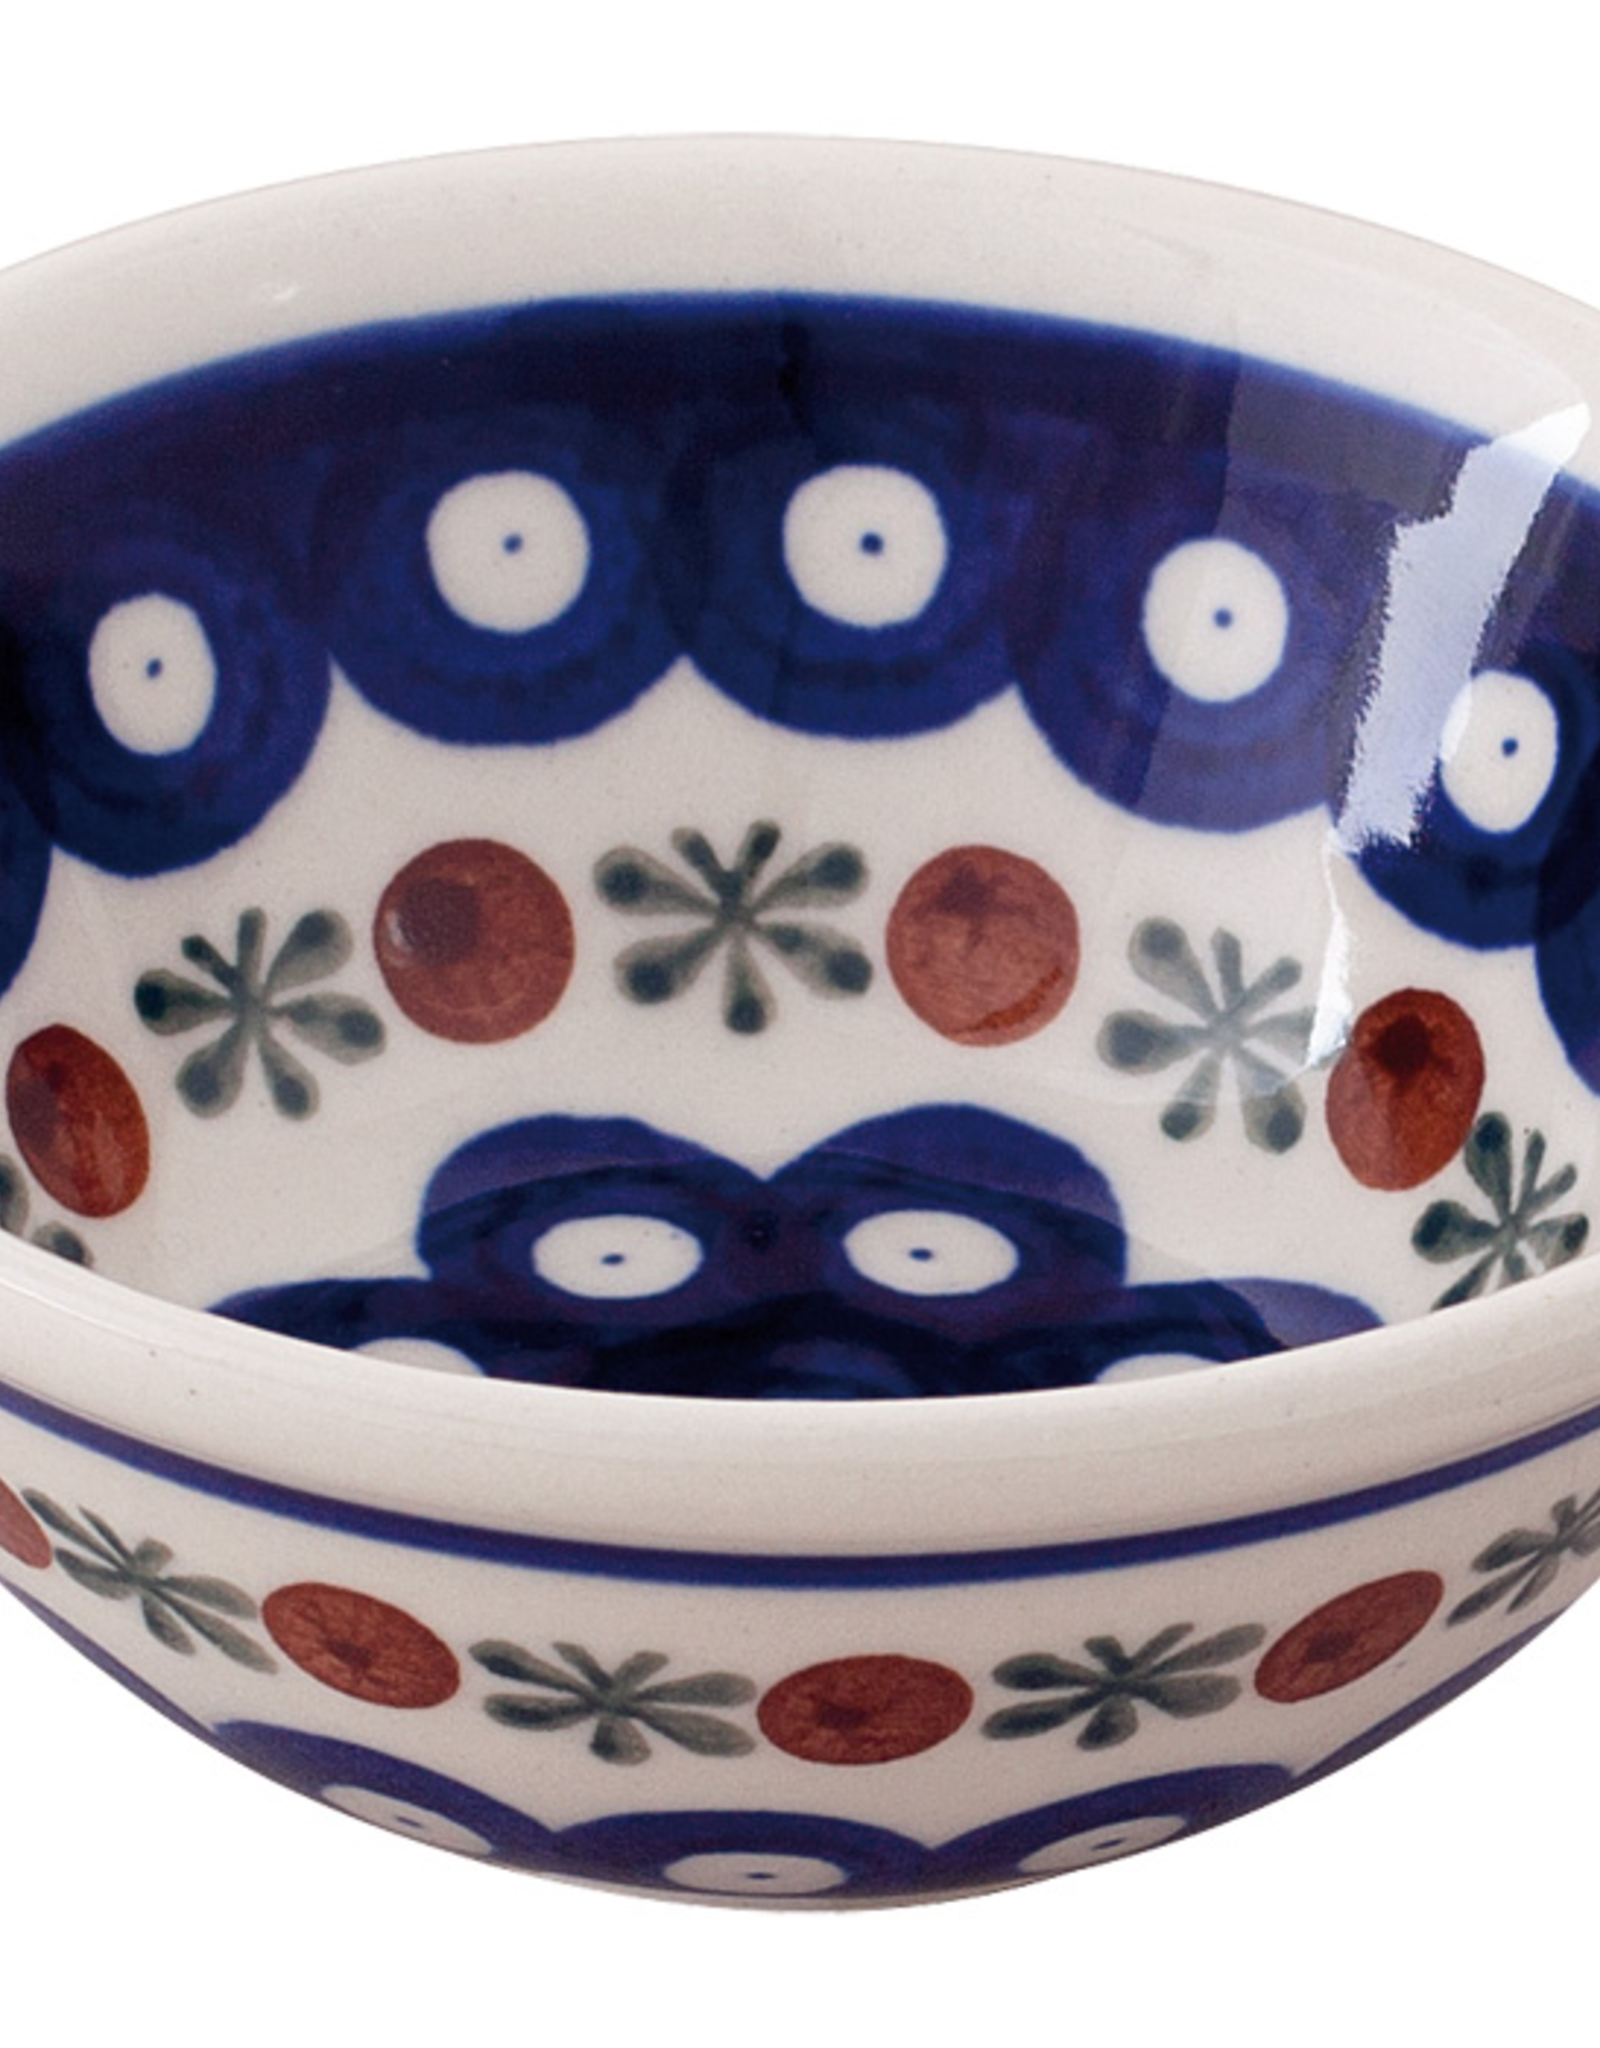 Redecker Redecker Ceramic Shaving Soap Bowl-Dark Pattern